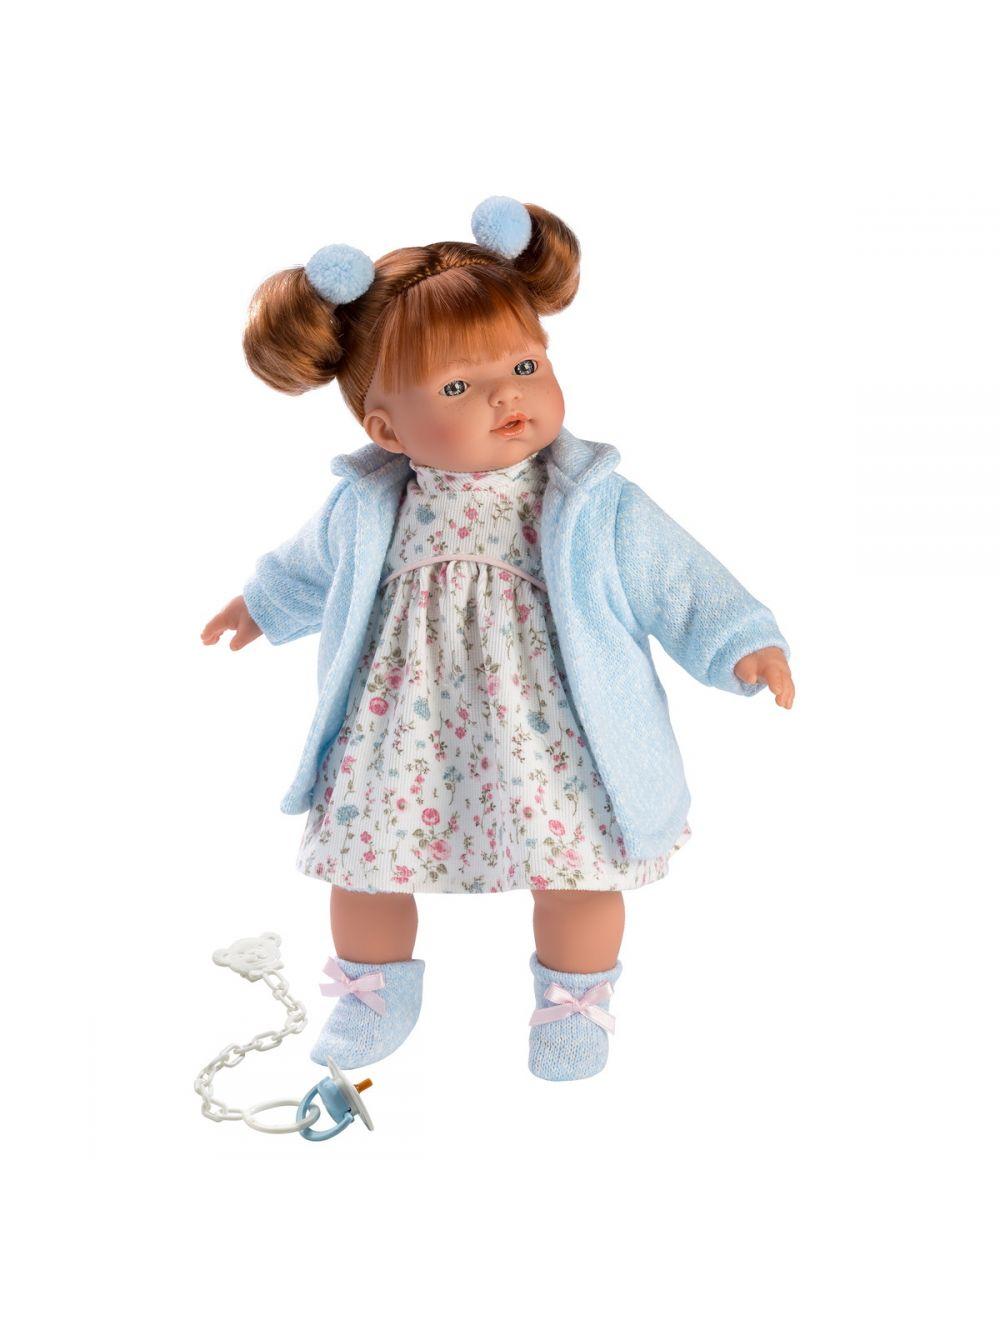 Llorens 33108 Lalka płacząca Lea 33 cm niebieska